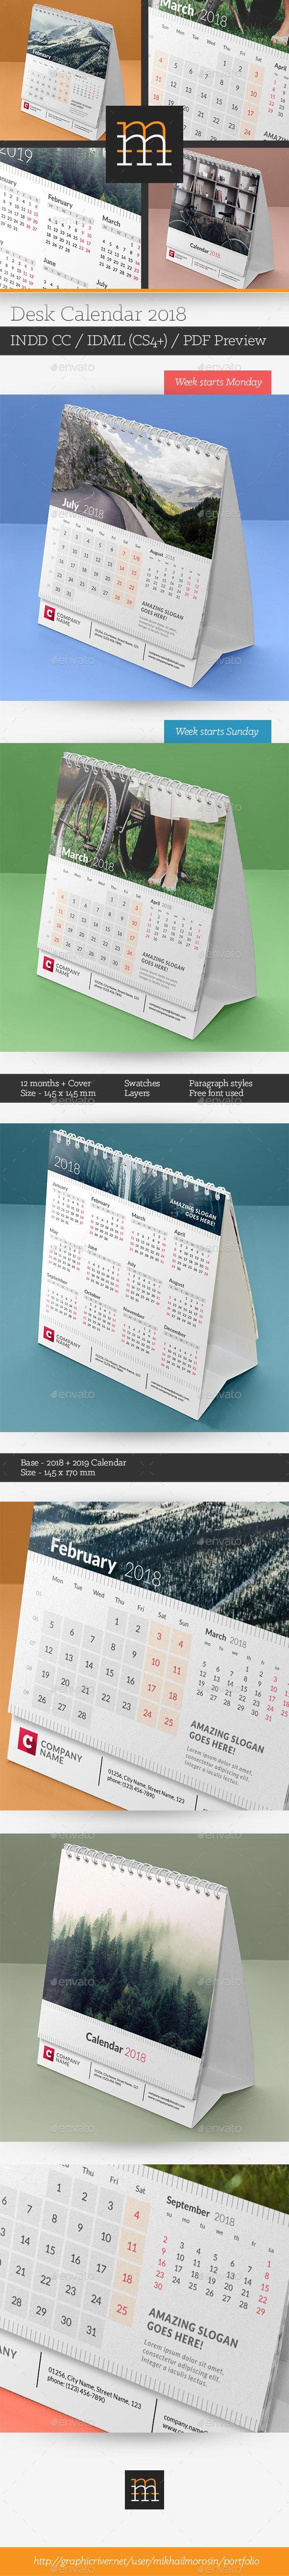 #corporate #Desk #Calendar #template #2018 - #creative #business Calendars Stationery #design. download; https://graphicriver.net/item/desk-calendar-2018/20347700?ref=yinkira